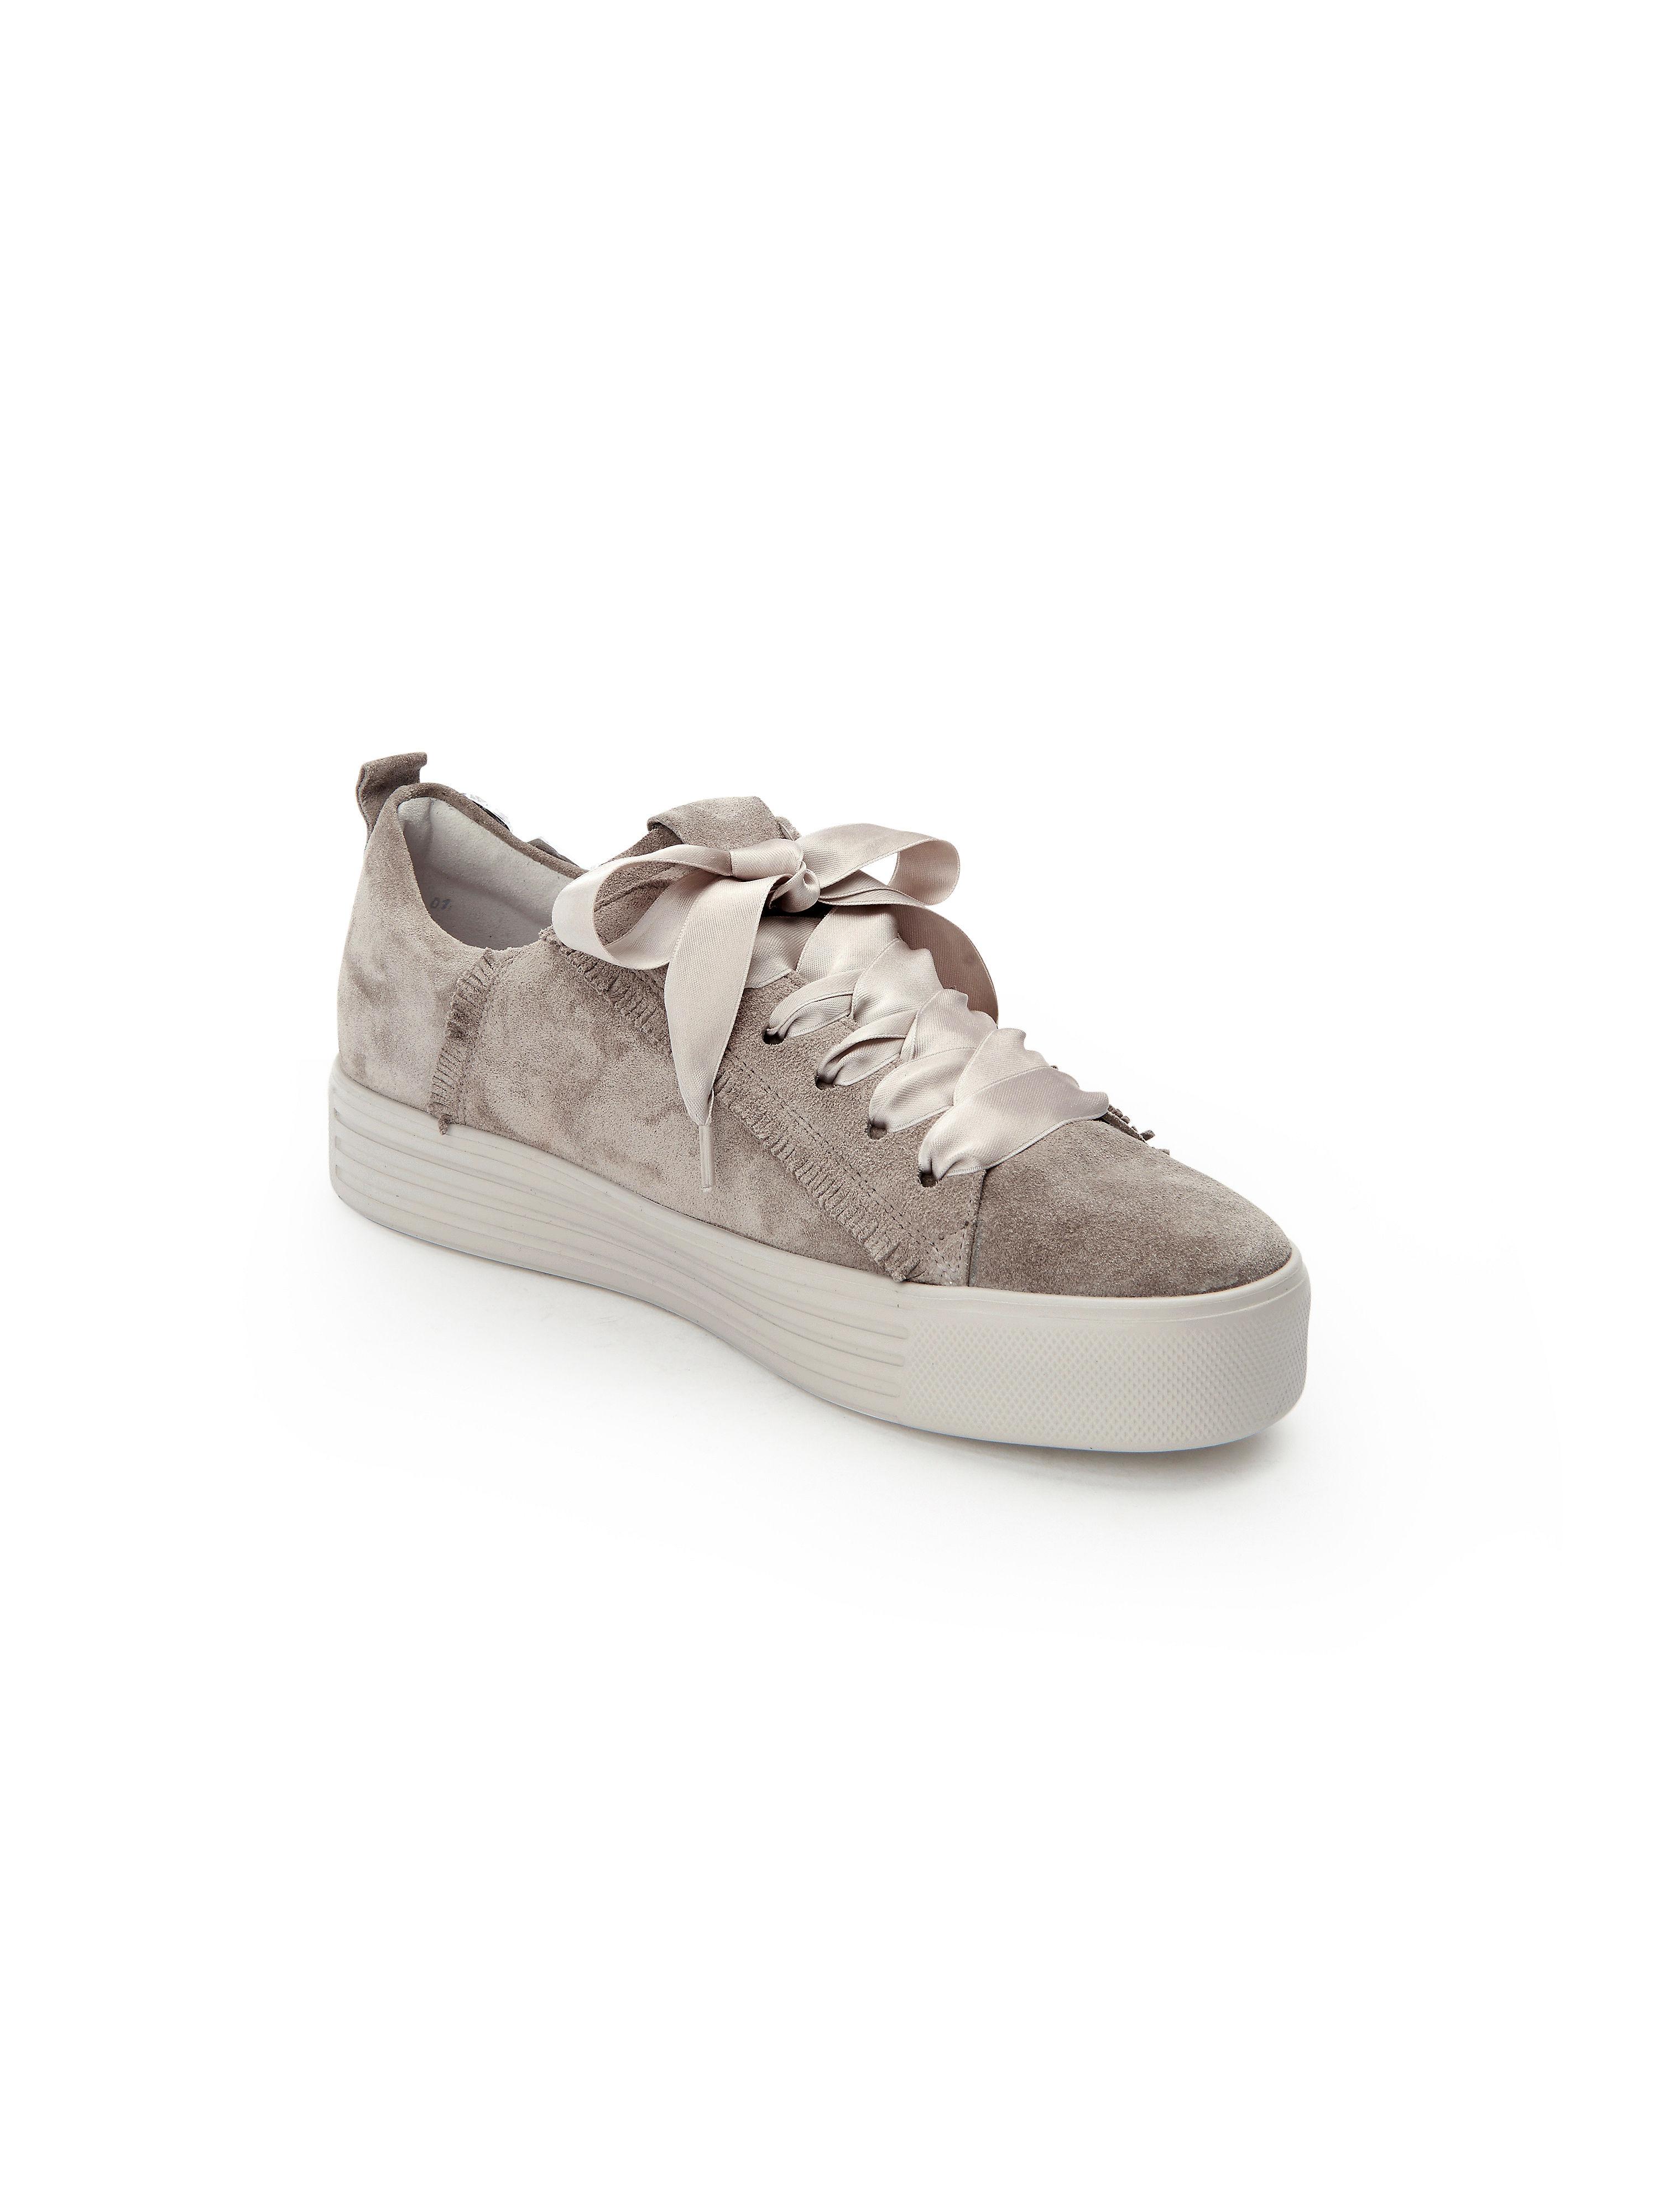 Kennel & Schmenger - Sneaker Town - Taupe Gute Qualität beliebte Schuhe